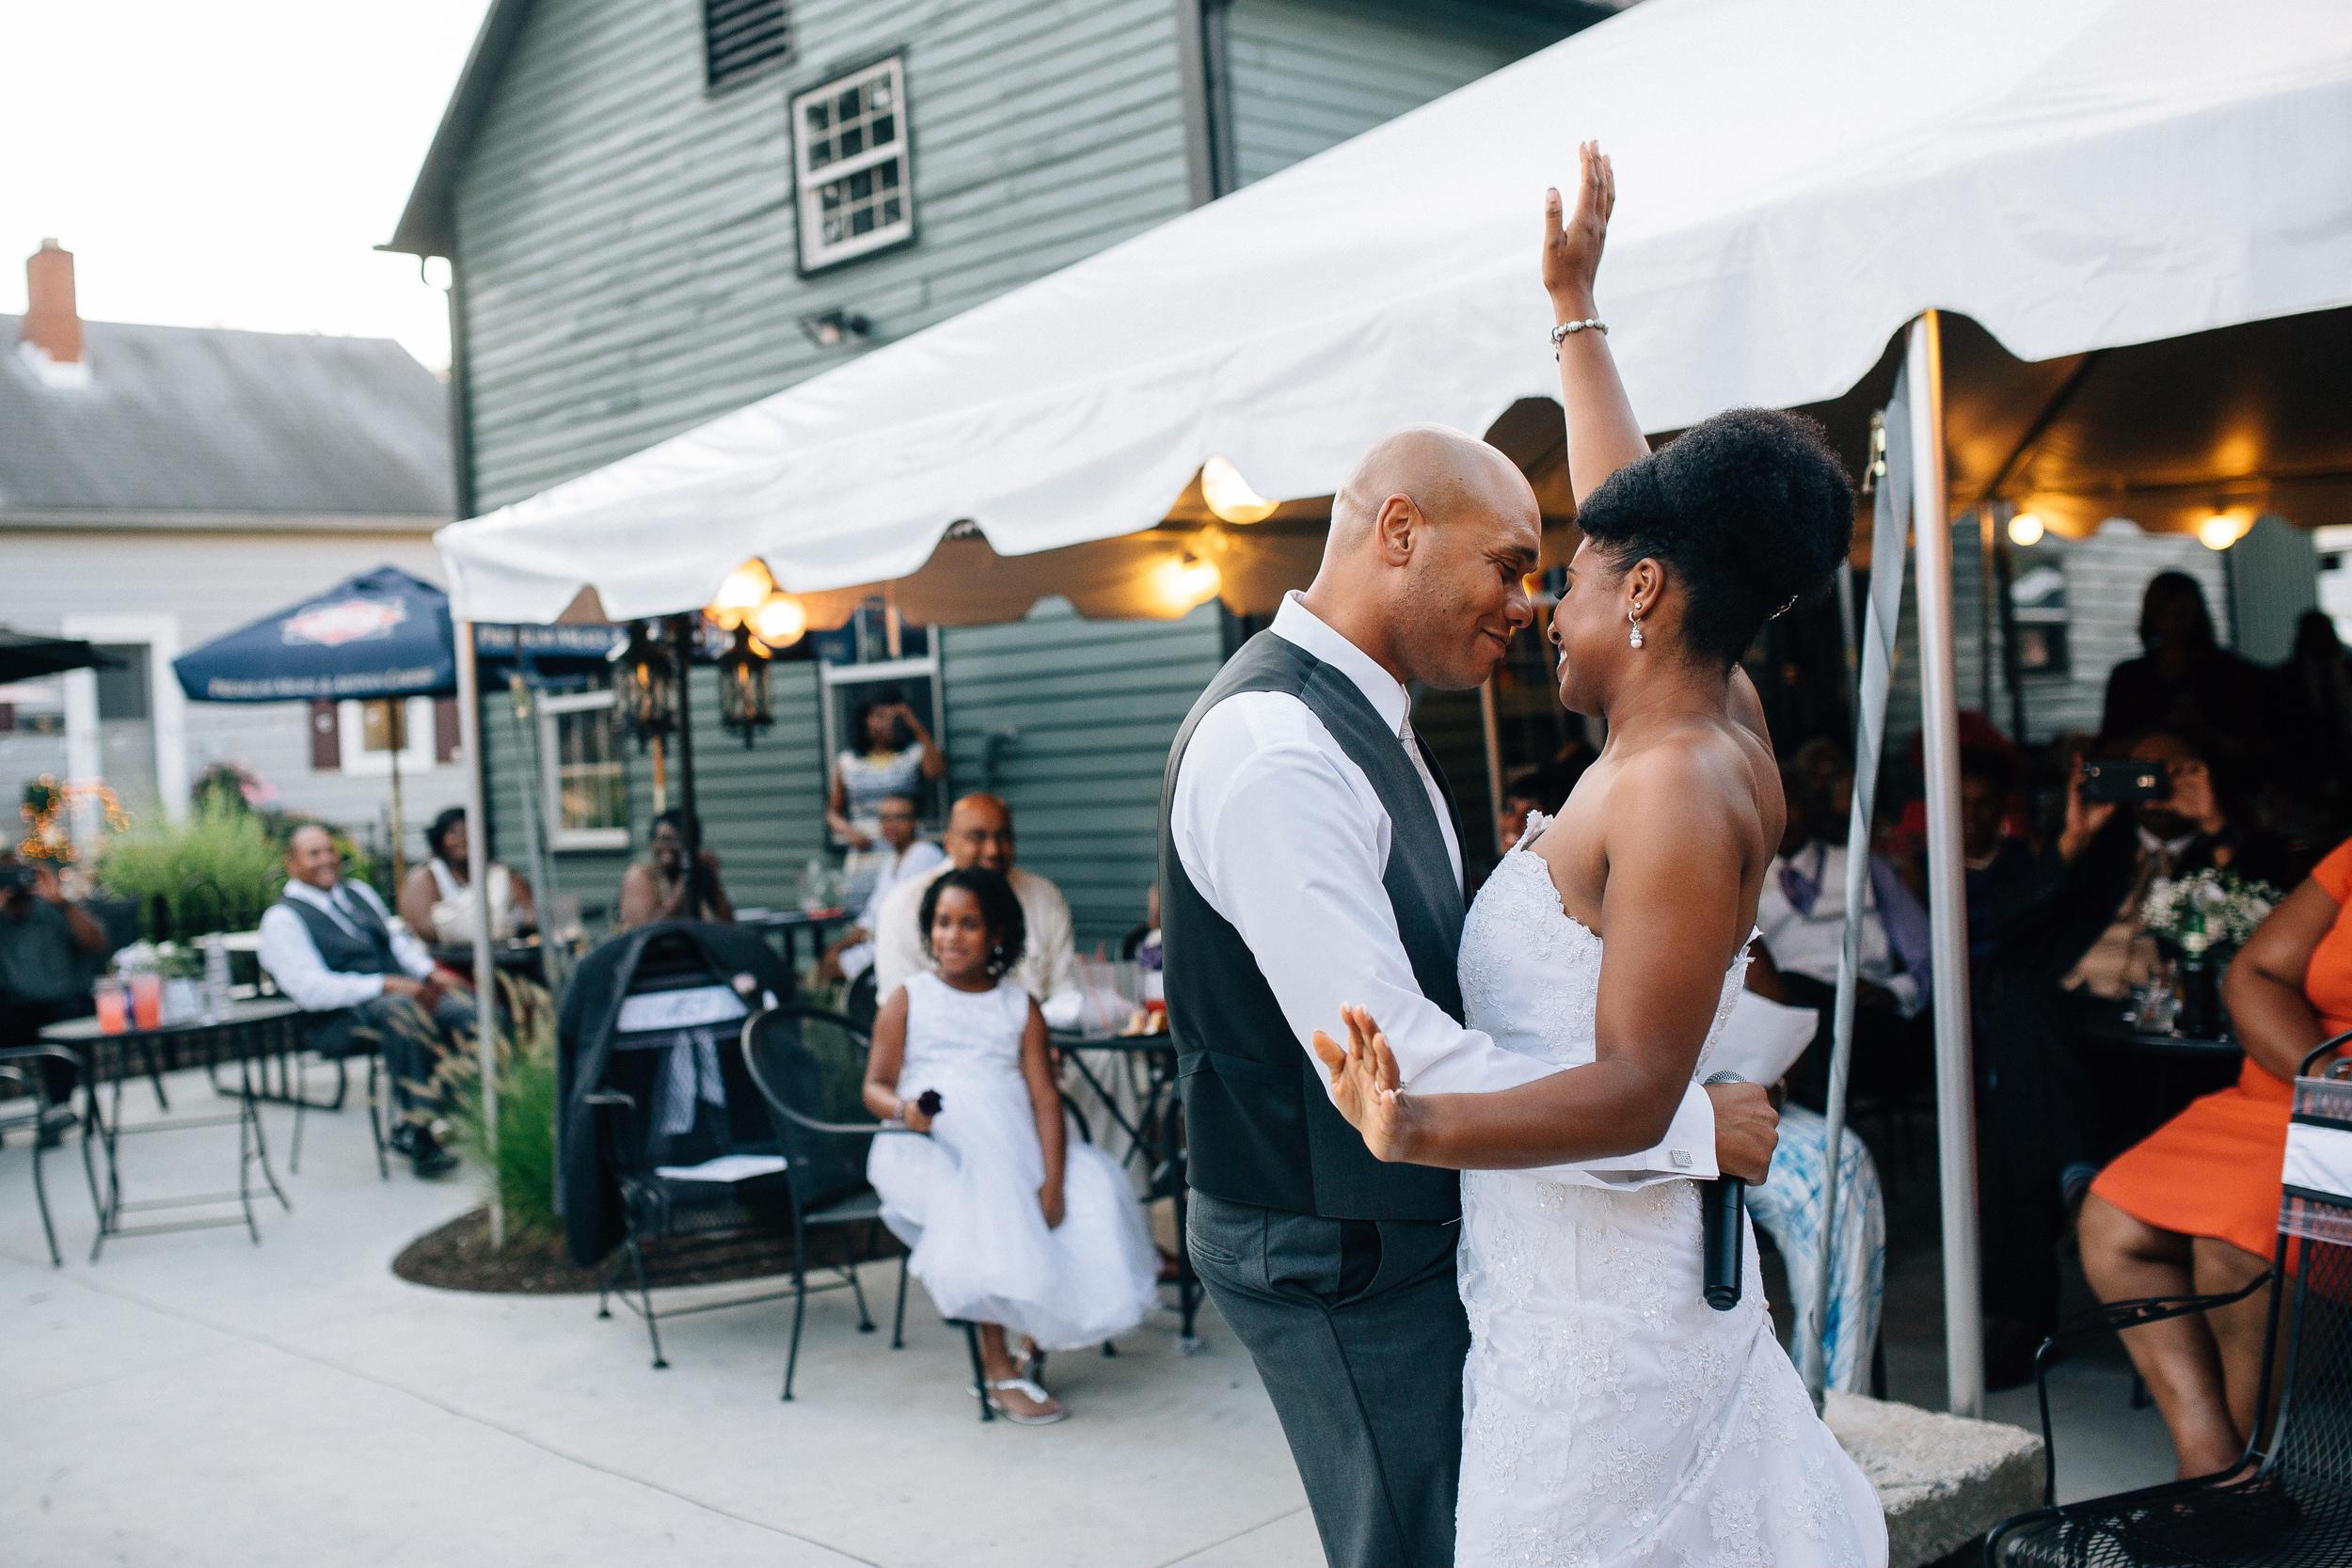 Chuck & Alicia's Wedding - Corrie Mick Photography-610.jpg